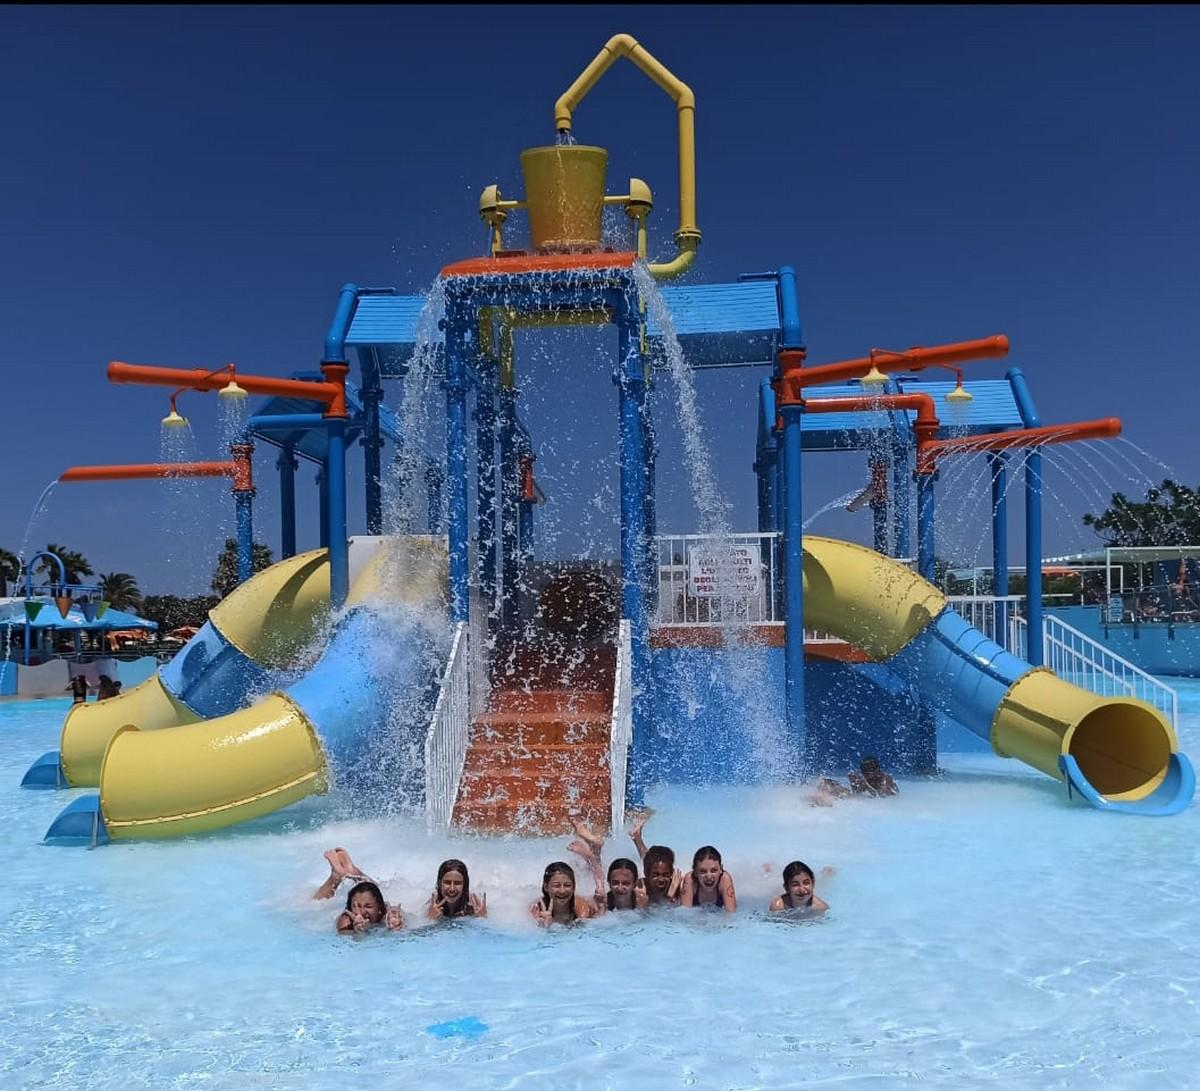 Hotel Santa Sabina 4**** // Avventure marine in Puglia // Junior Archivi --SANTASABINA-AVVENTUREMARINE-TURNO1-GIORNO7-6